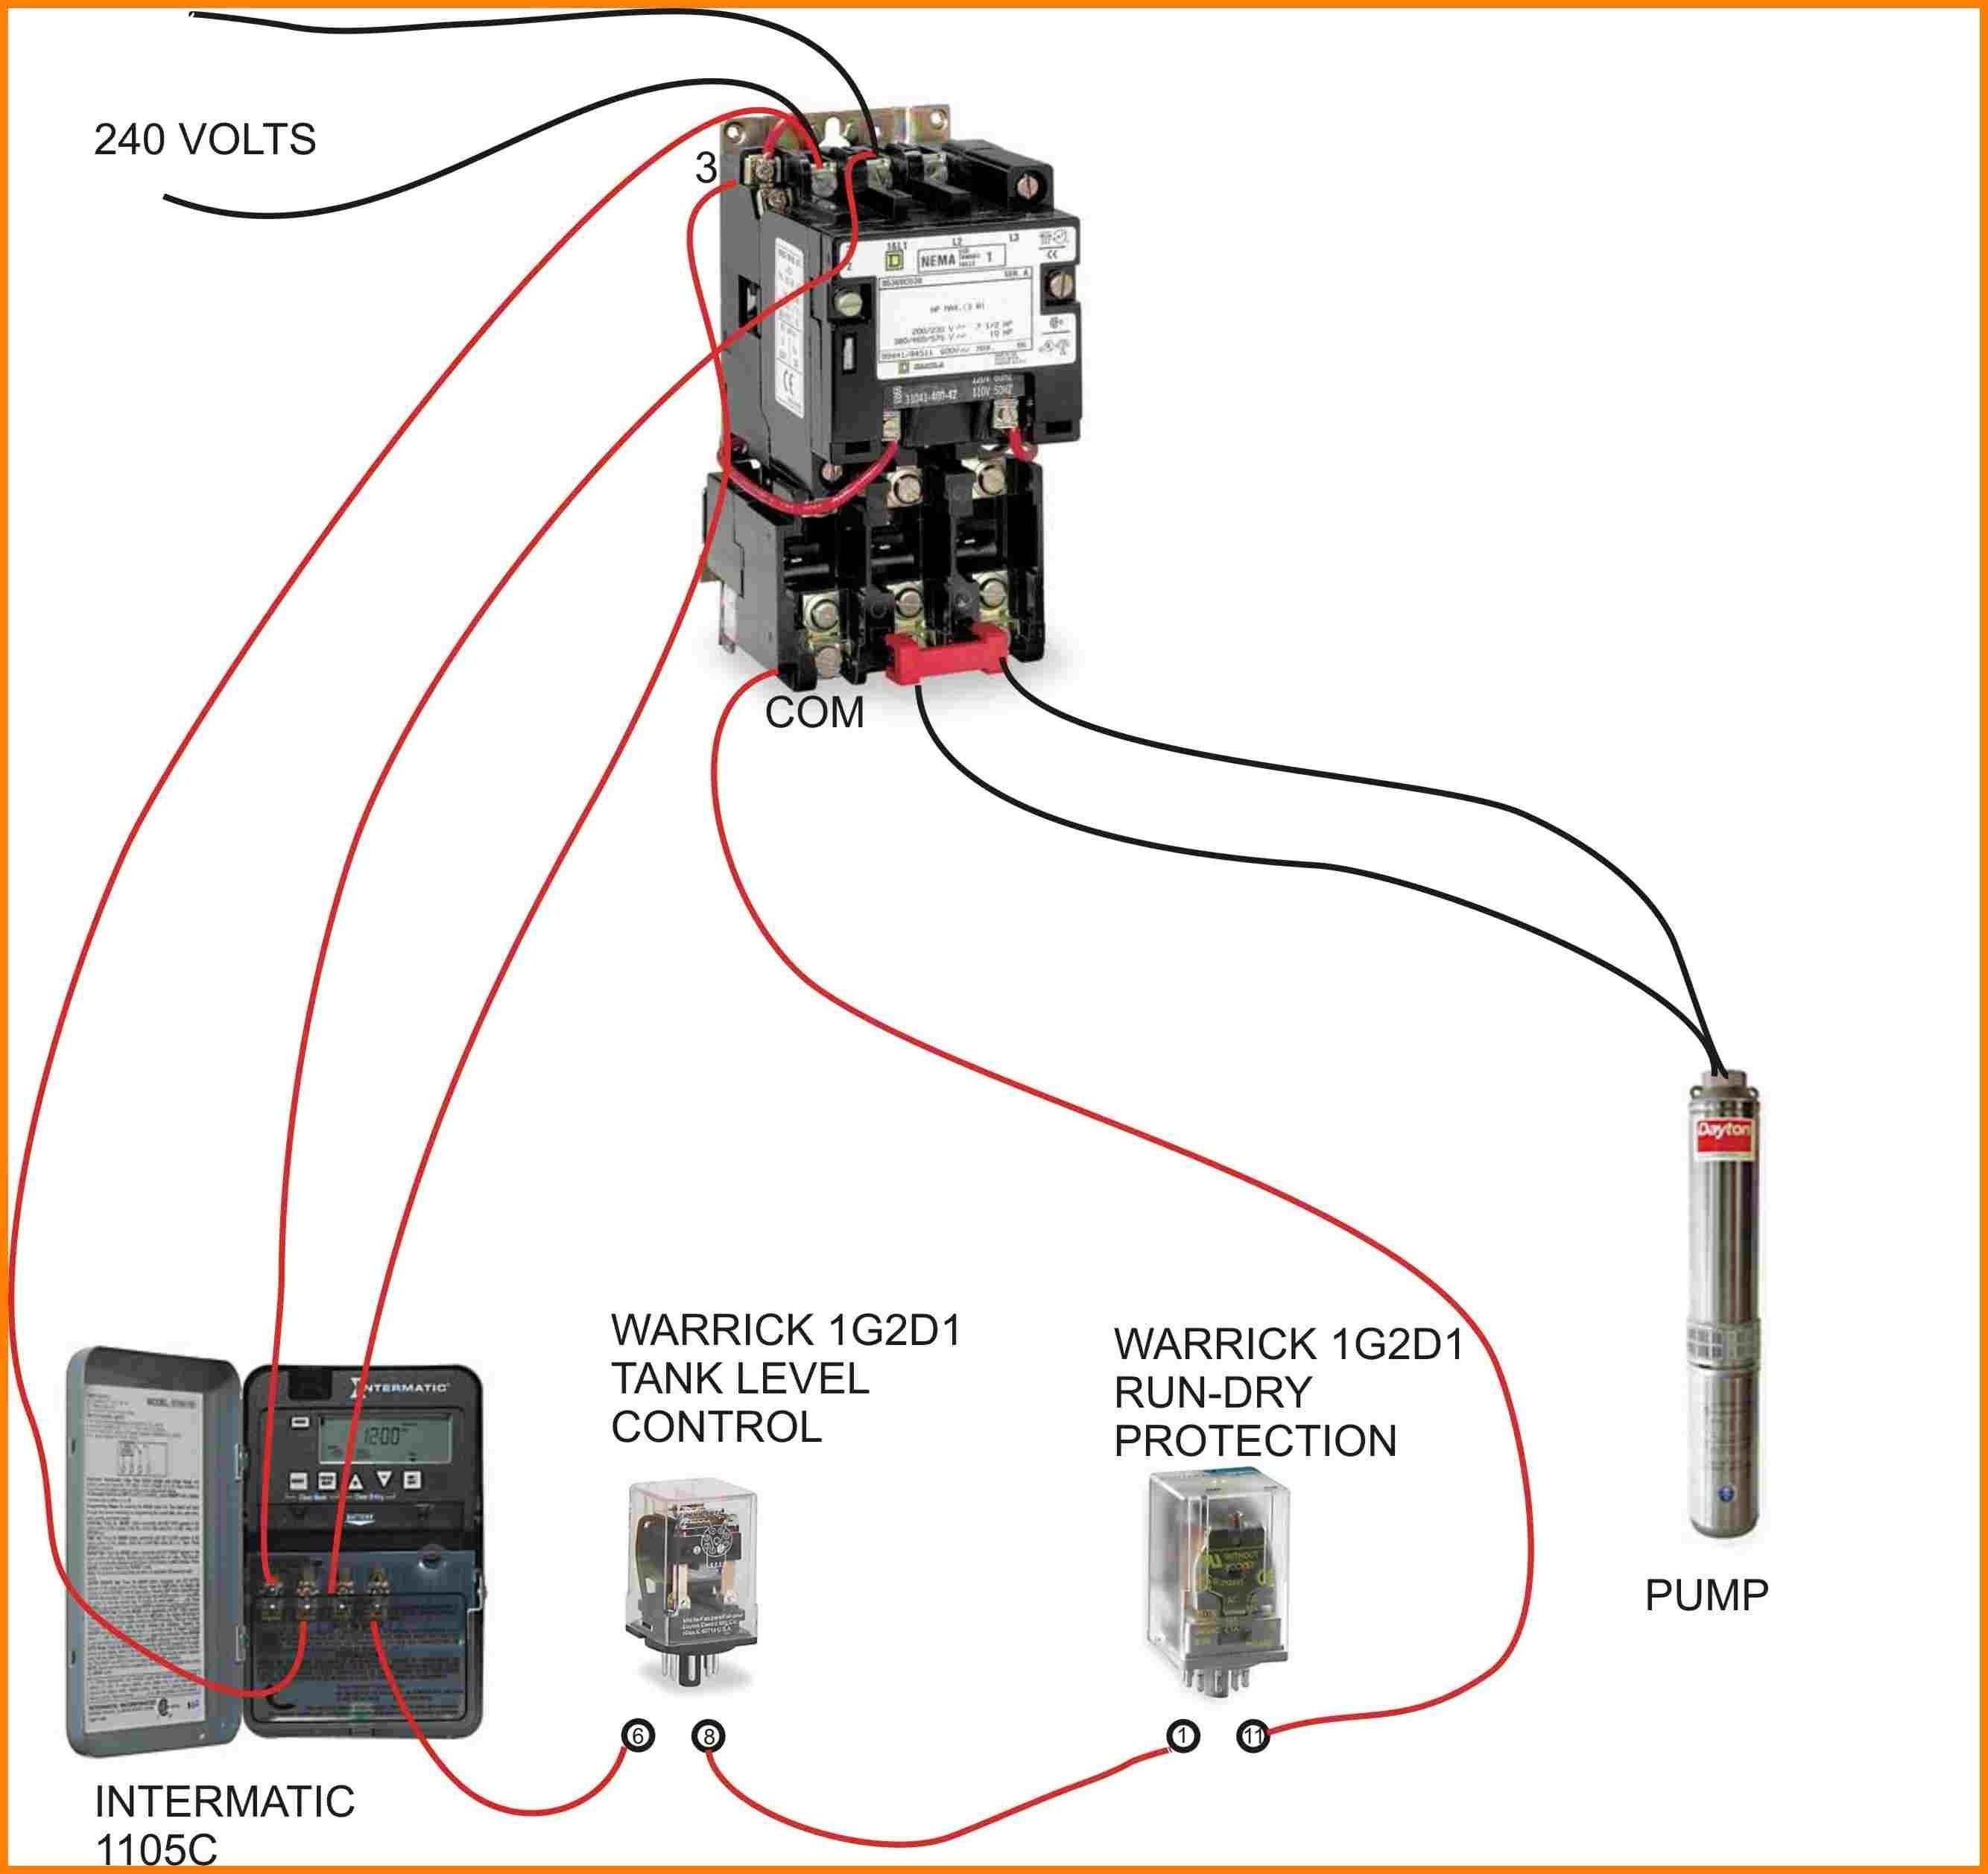 2 Pole Contactor Wiring Diagram Eaton C25bnb230a Wiring Diagram Electrical Circuit 2 Pole Contactor Of 2 Pole Contactor Wiring Diagram